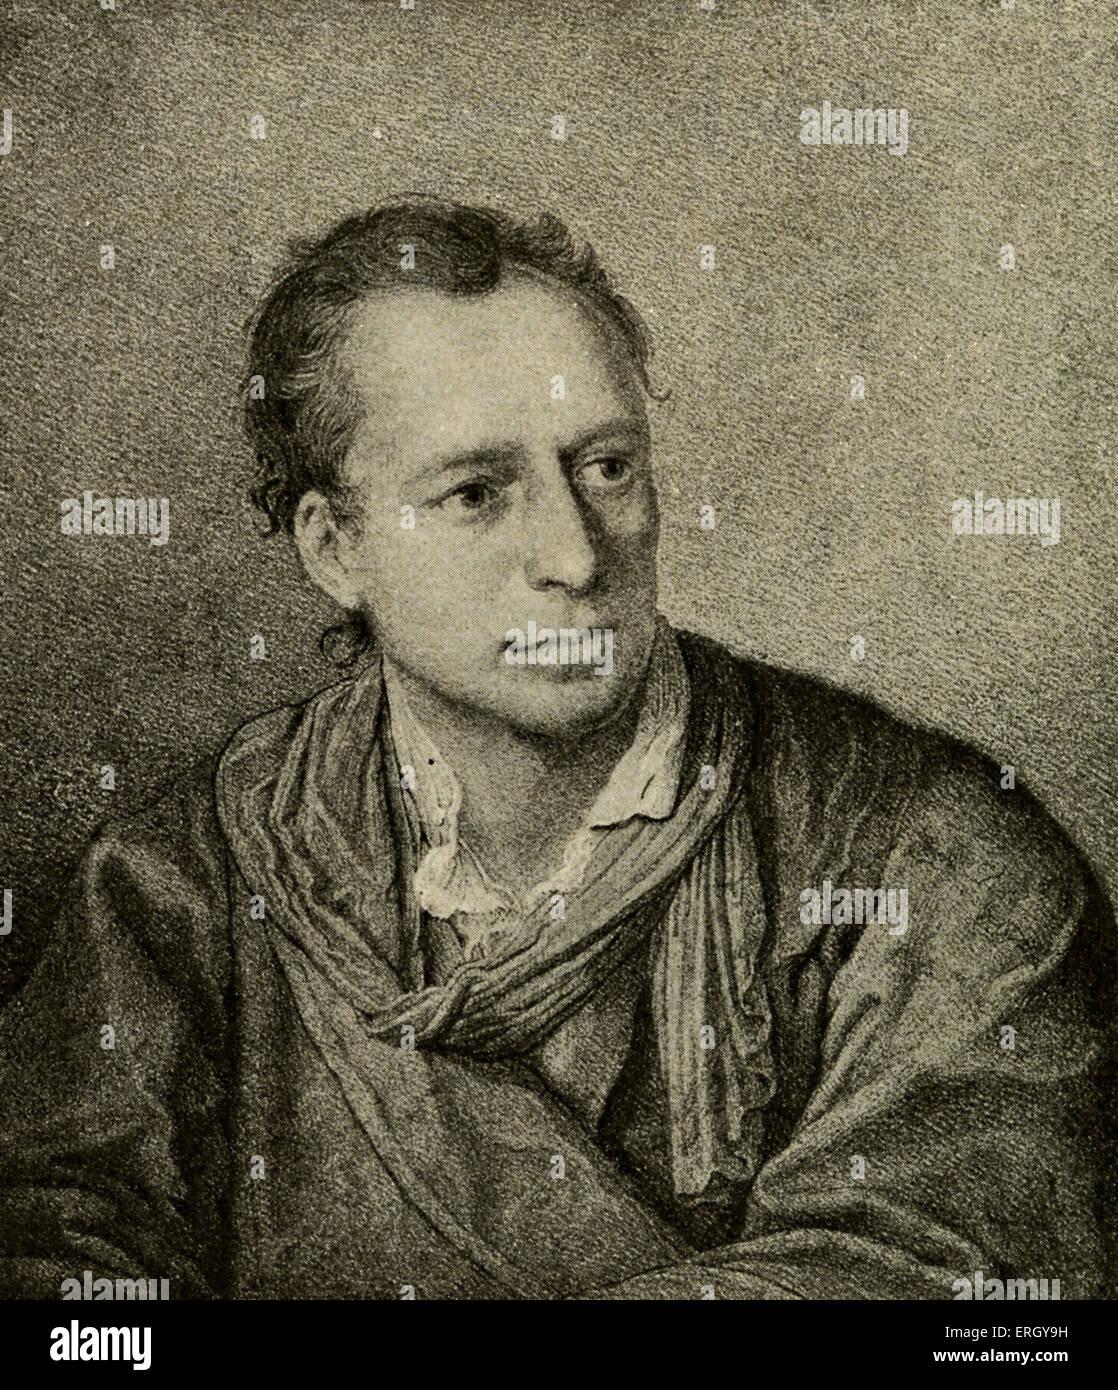 Johann Joachim Winckelmann. Lithograph after the painting by Angelika Kauffmann. German art historian and archeologist: - Stock Image